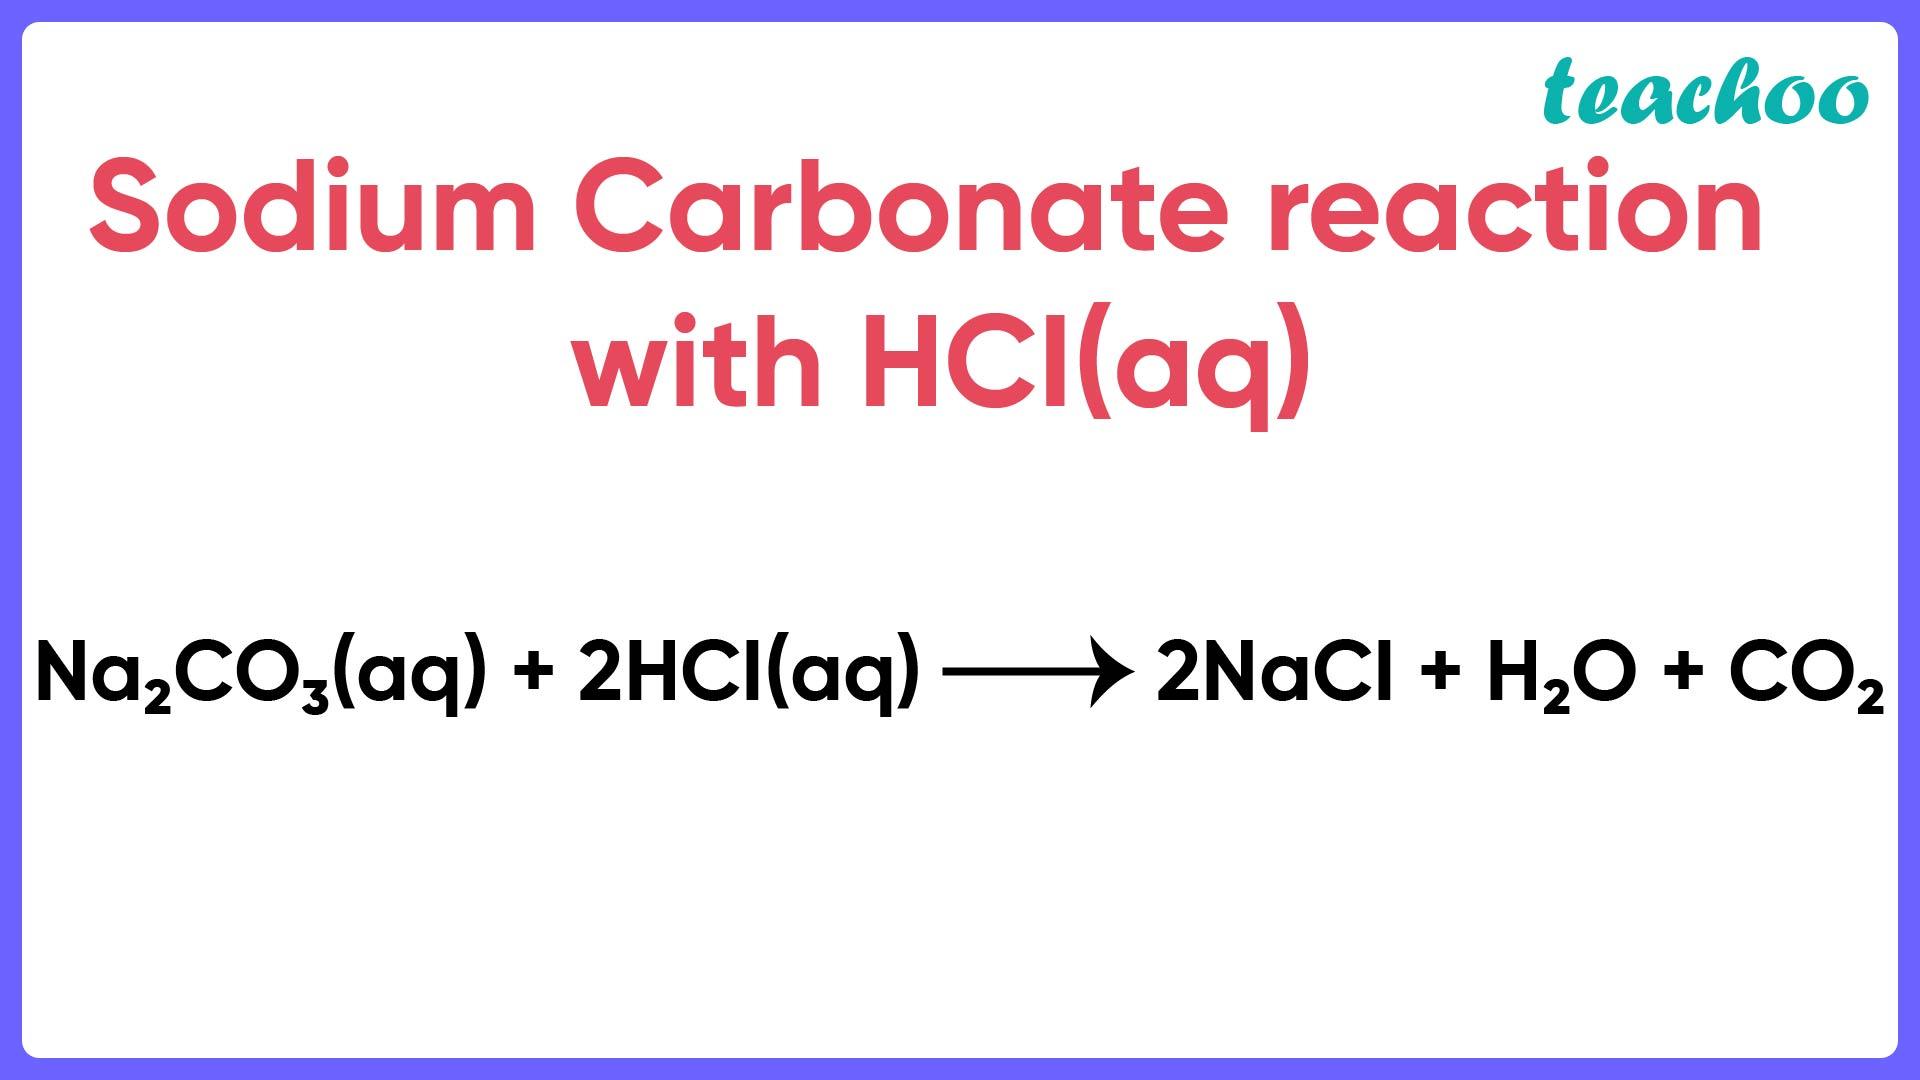 Sodium Carbonate reaction with HCl (aq) - Teachoo-01.jpg